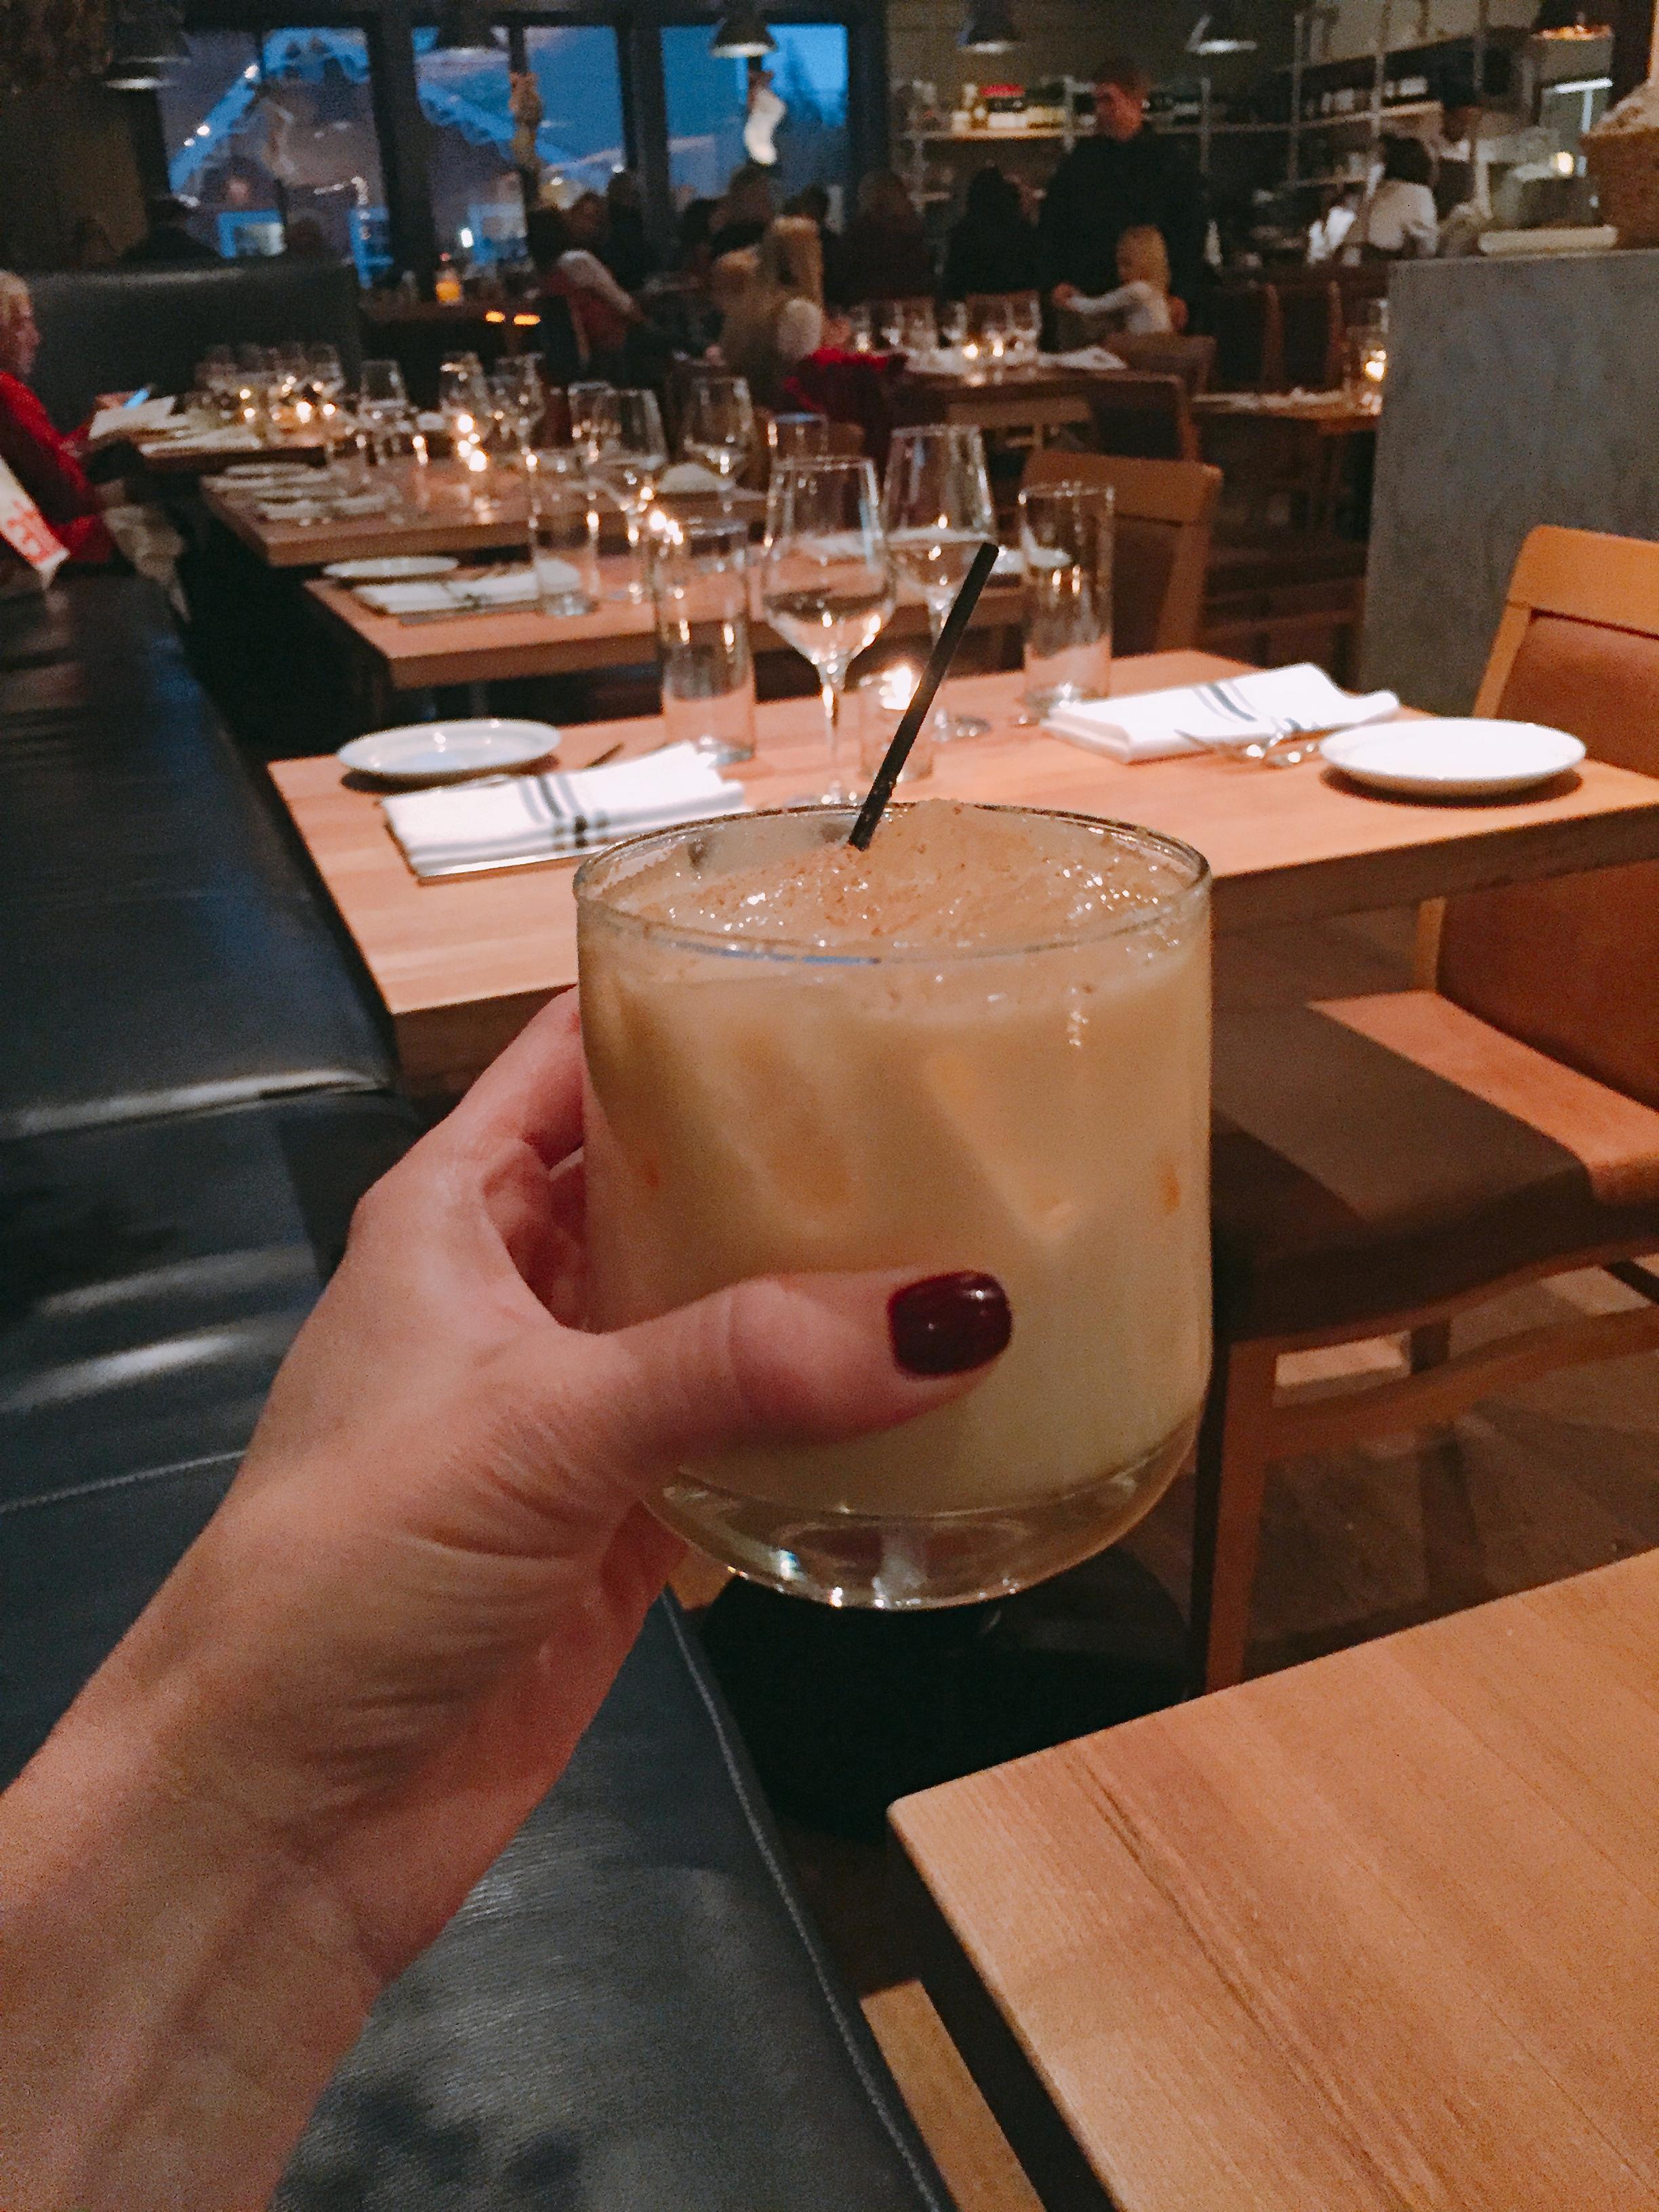 Mmmm... Christmas in a glass.